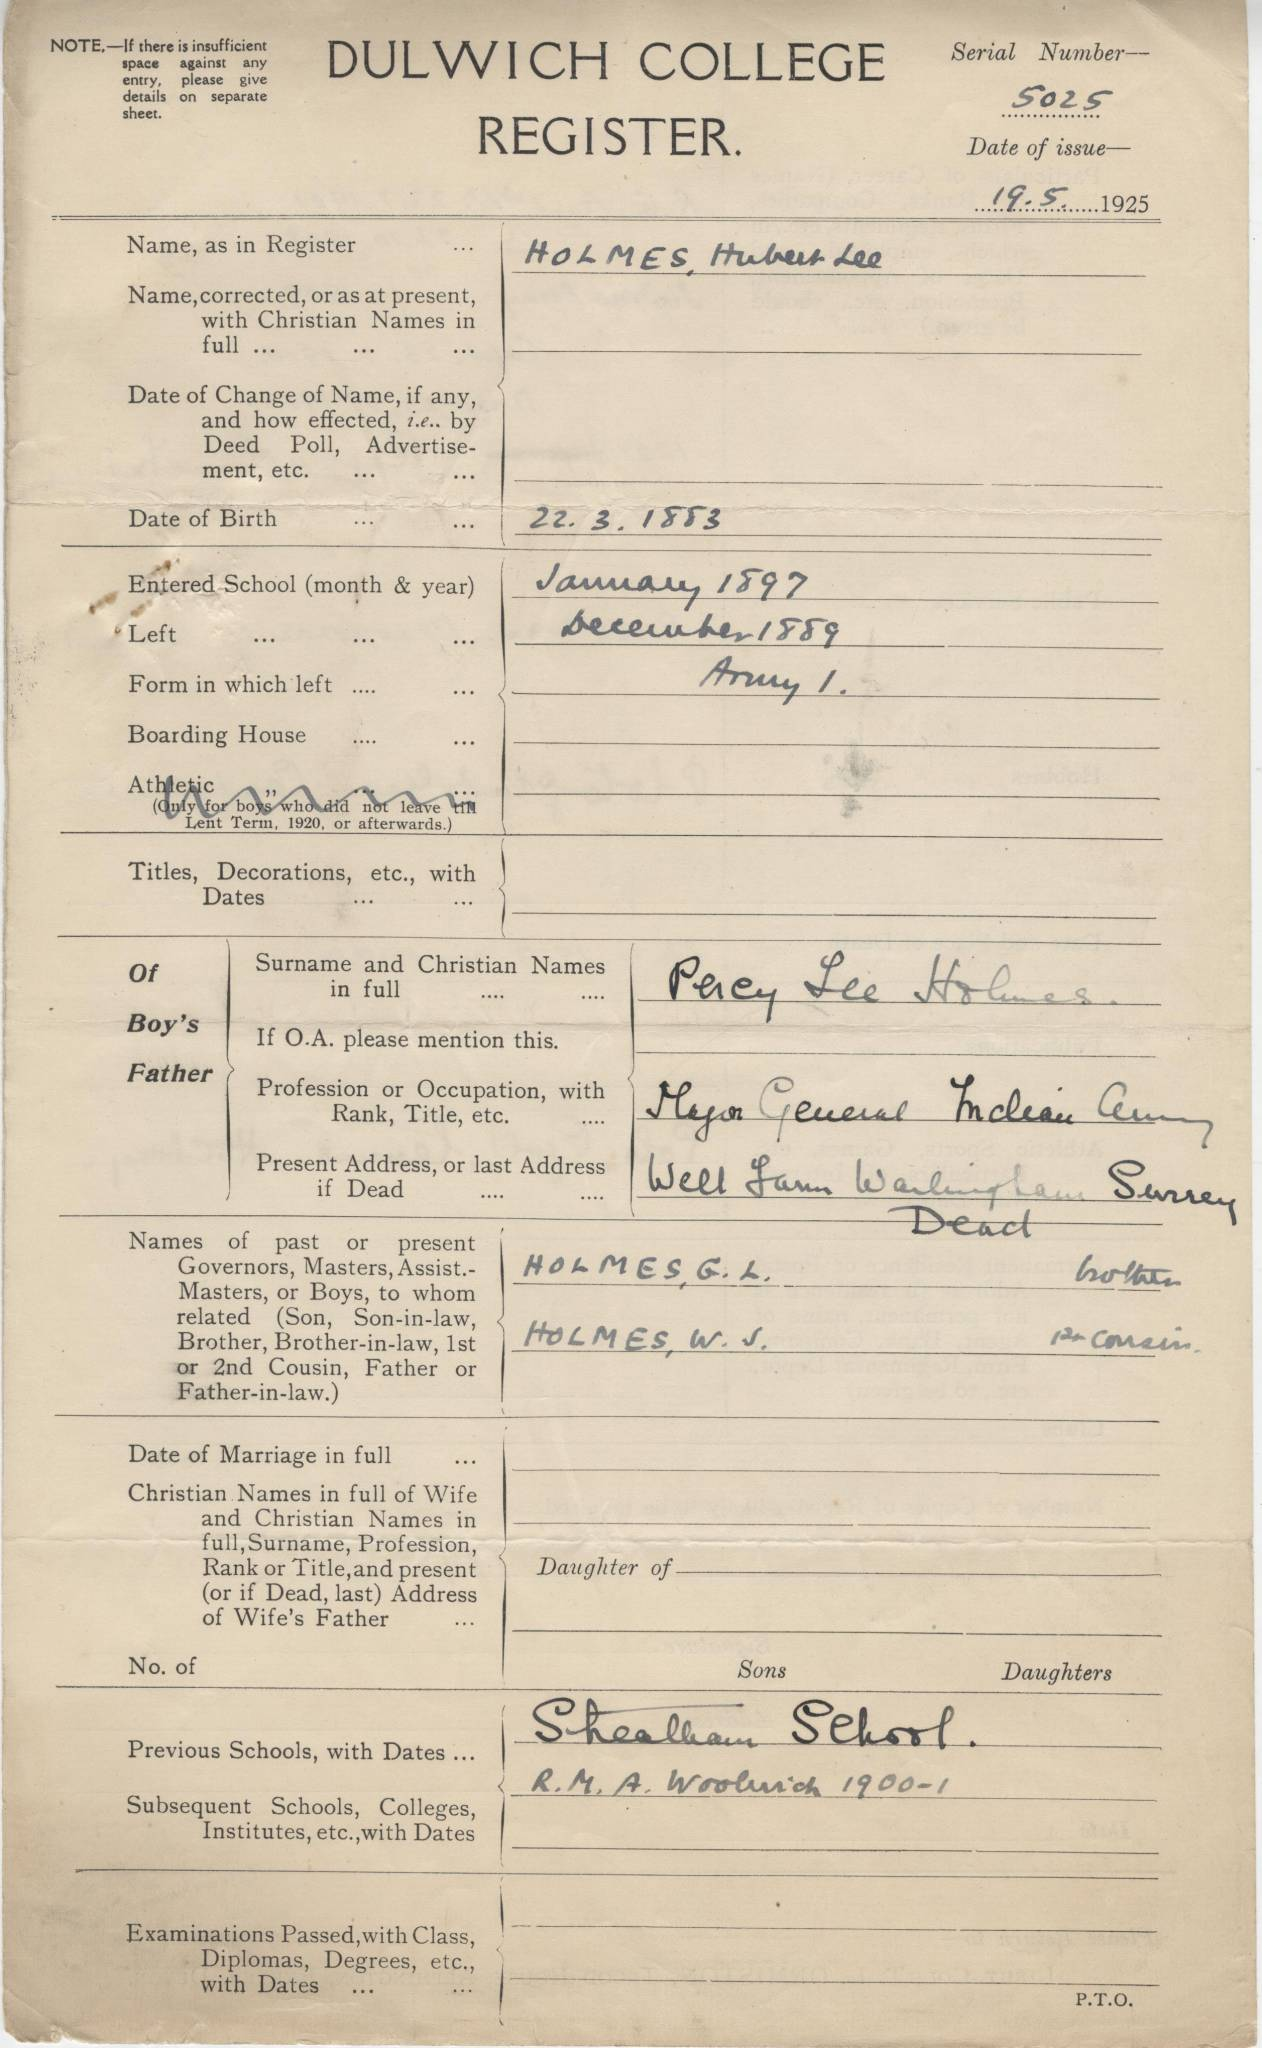 Holmes HL Questionnaire 1